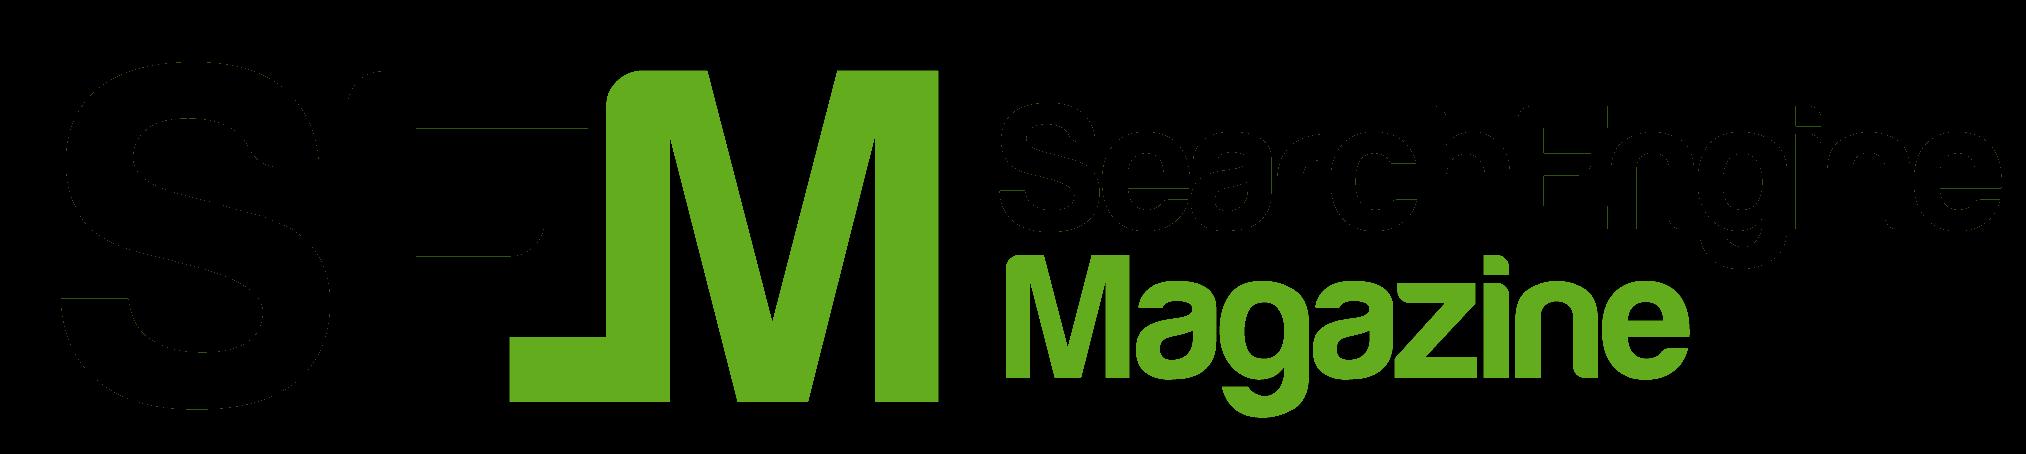 Search Engine Magazine